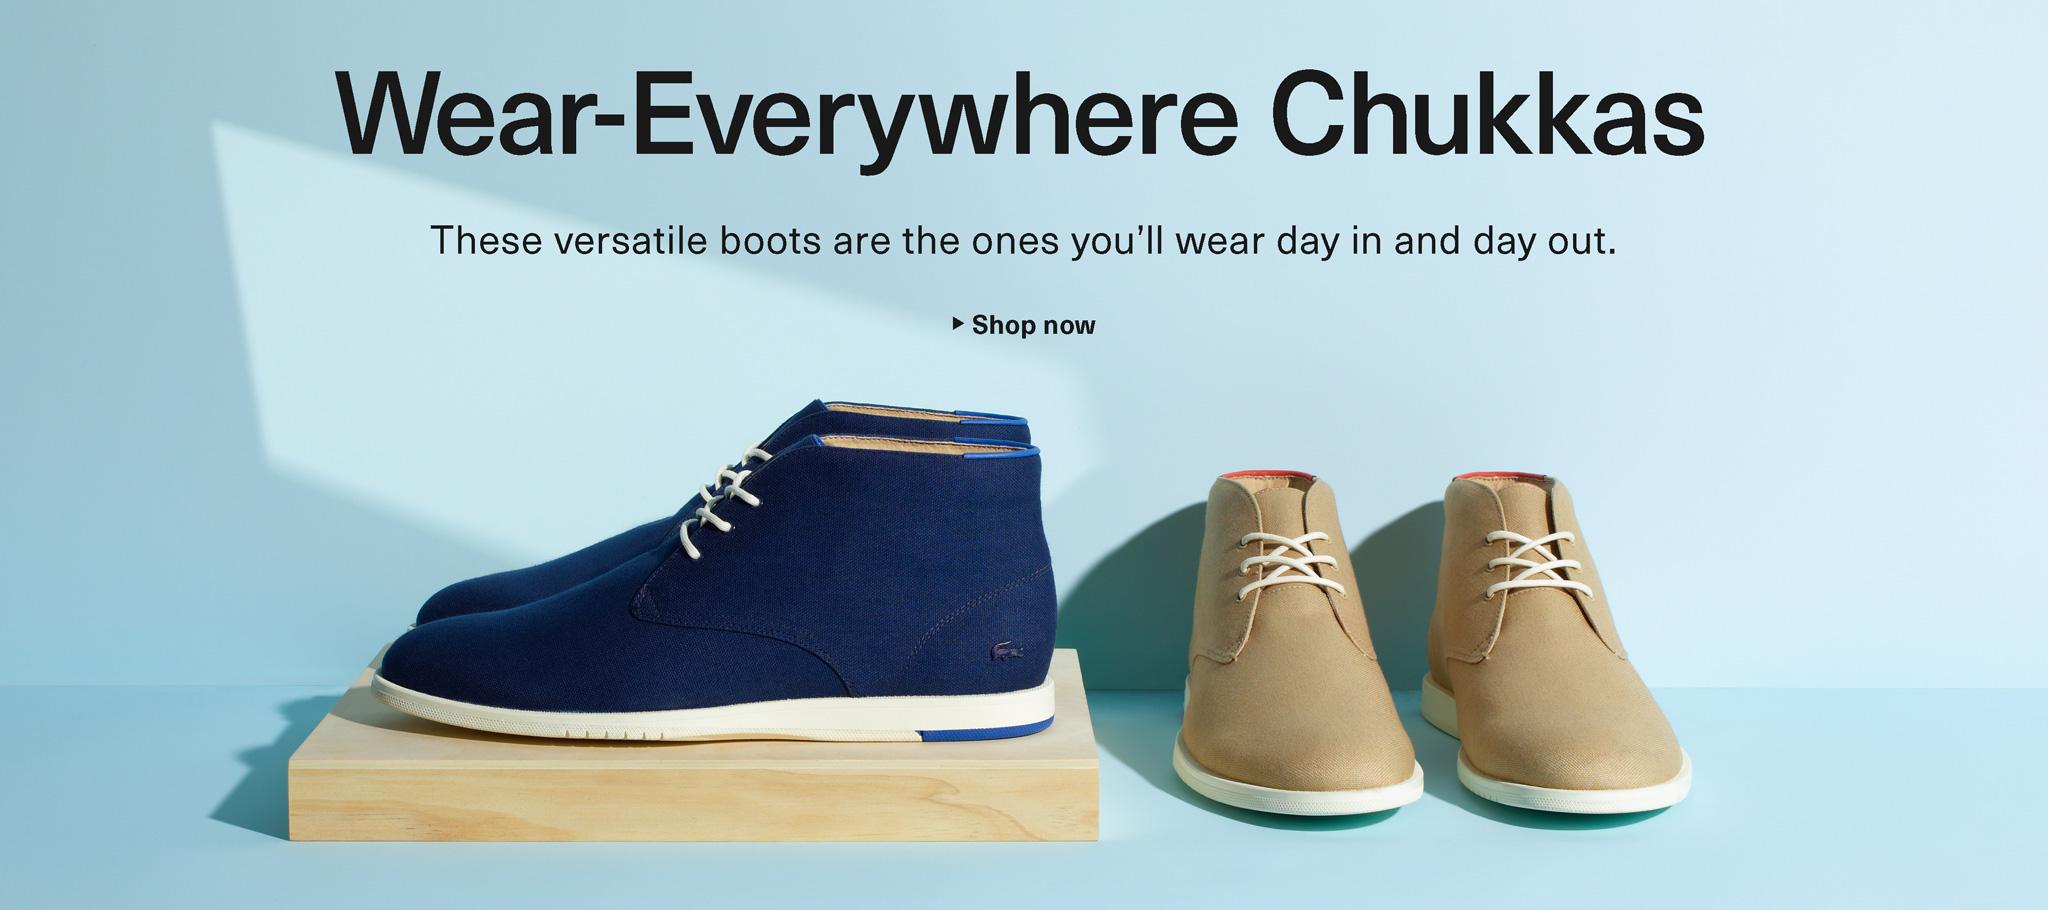 Wear-Everywhere Chukkas